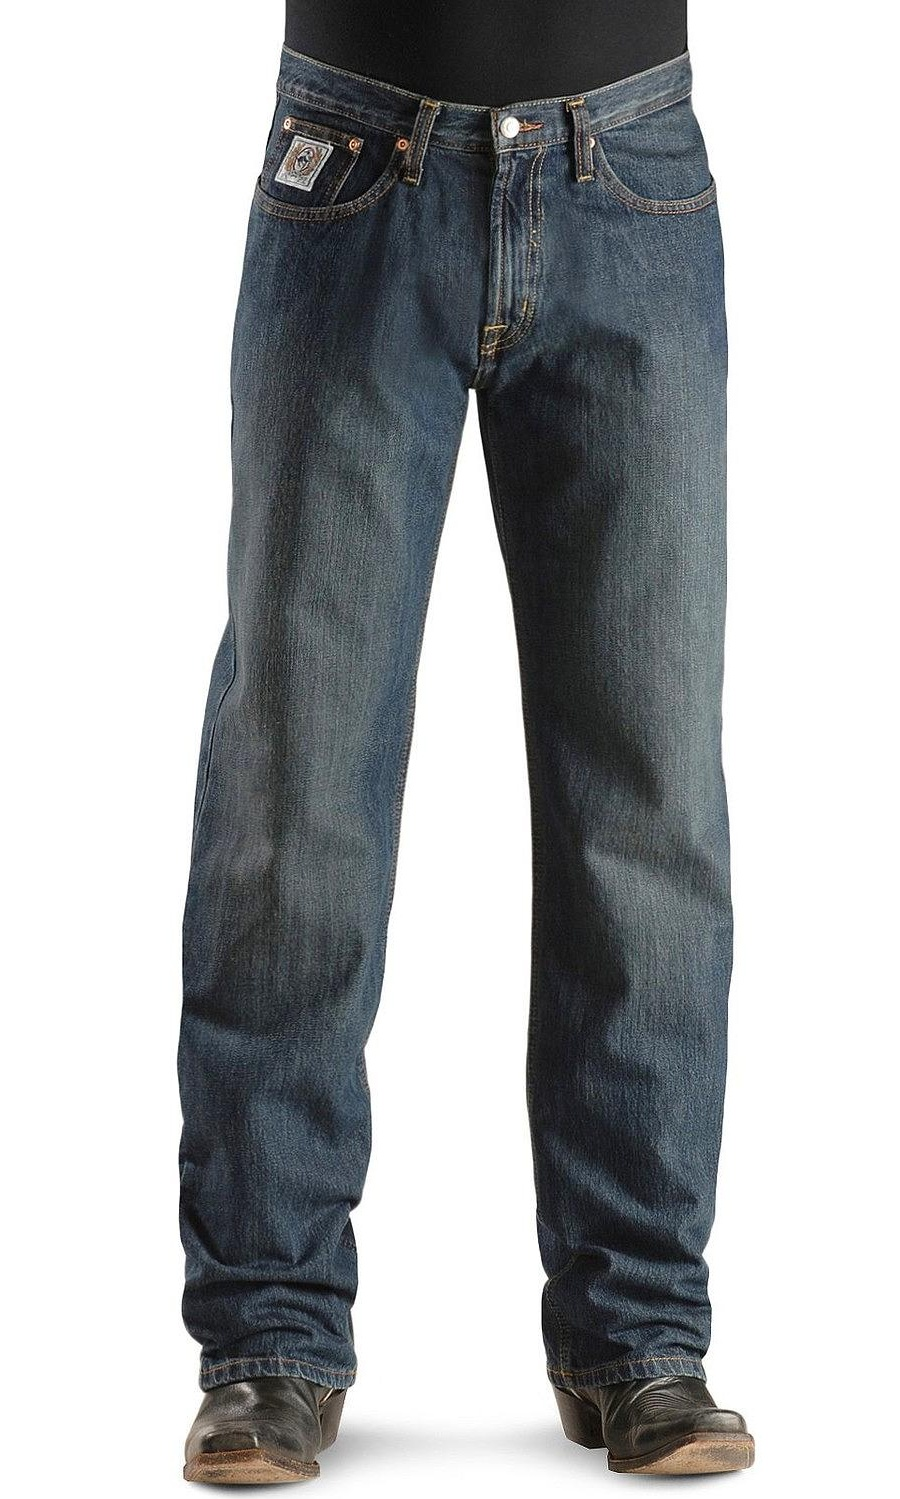 Cinch Men/'s White Label Relaxed Fit Jean Choose SZ//color Ultra//Co